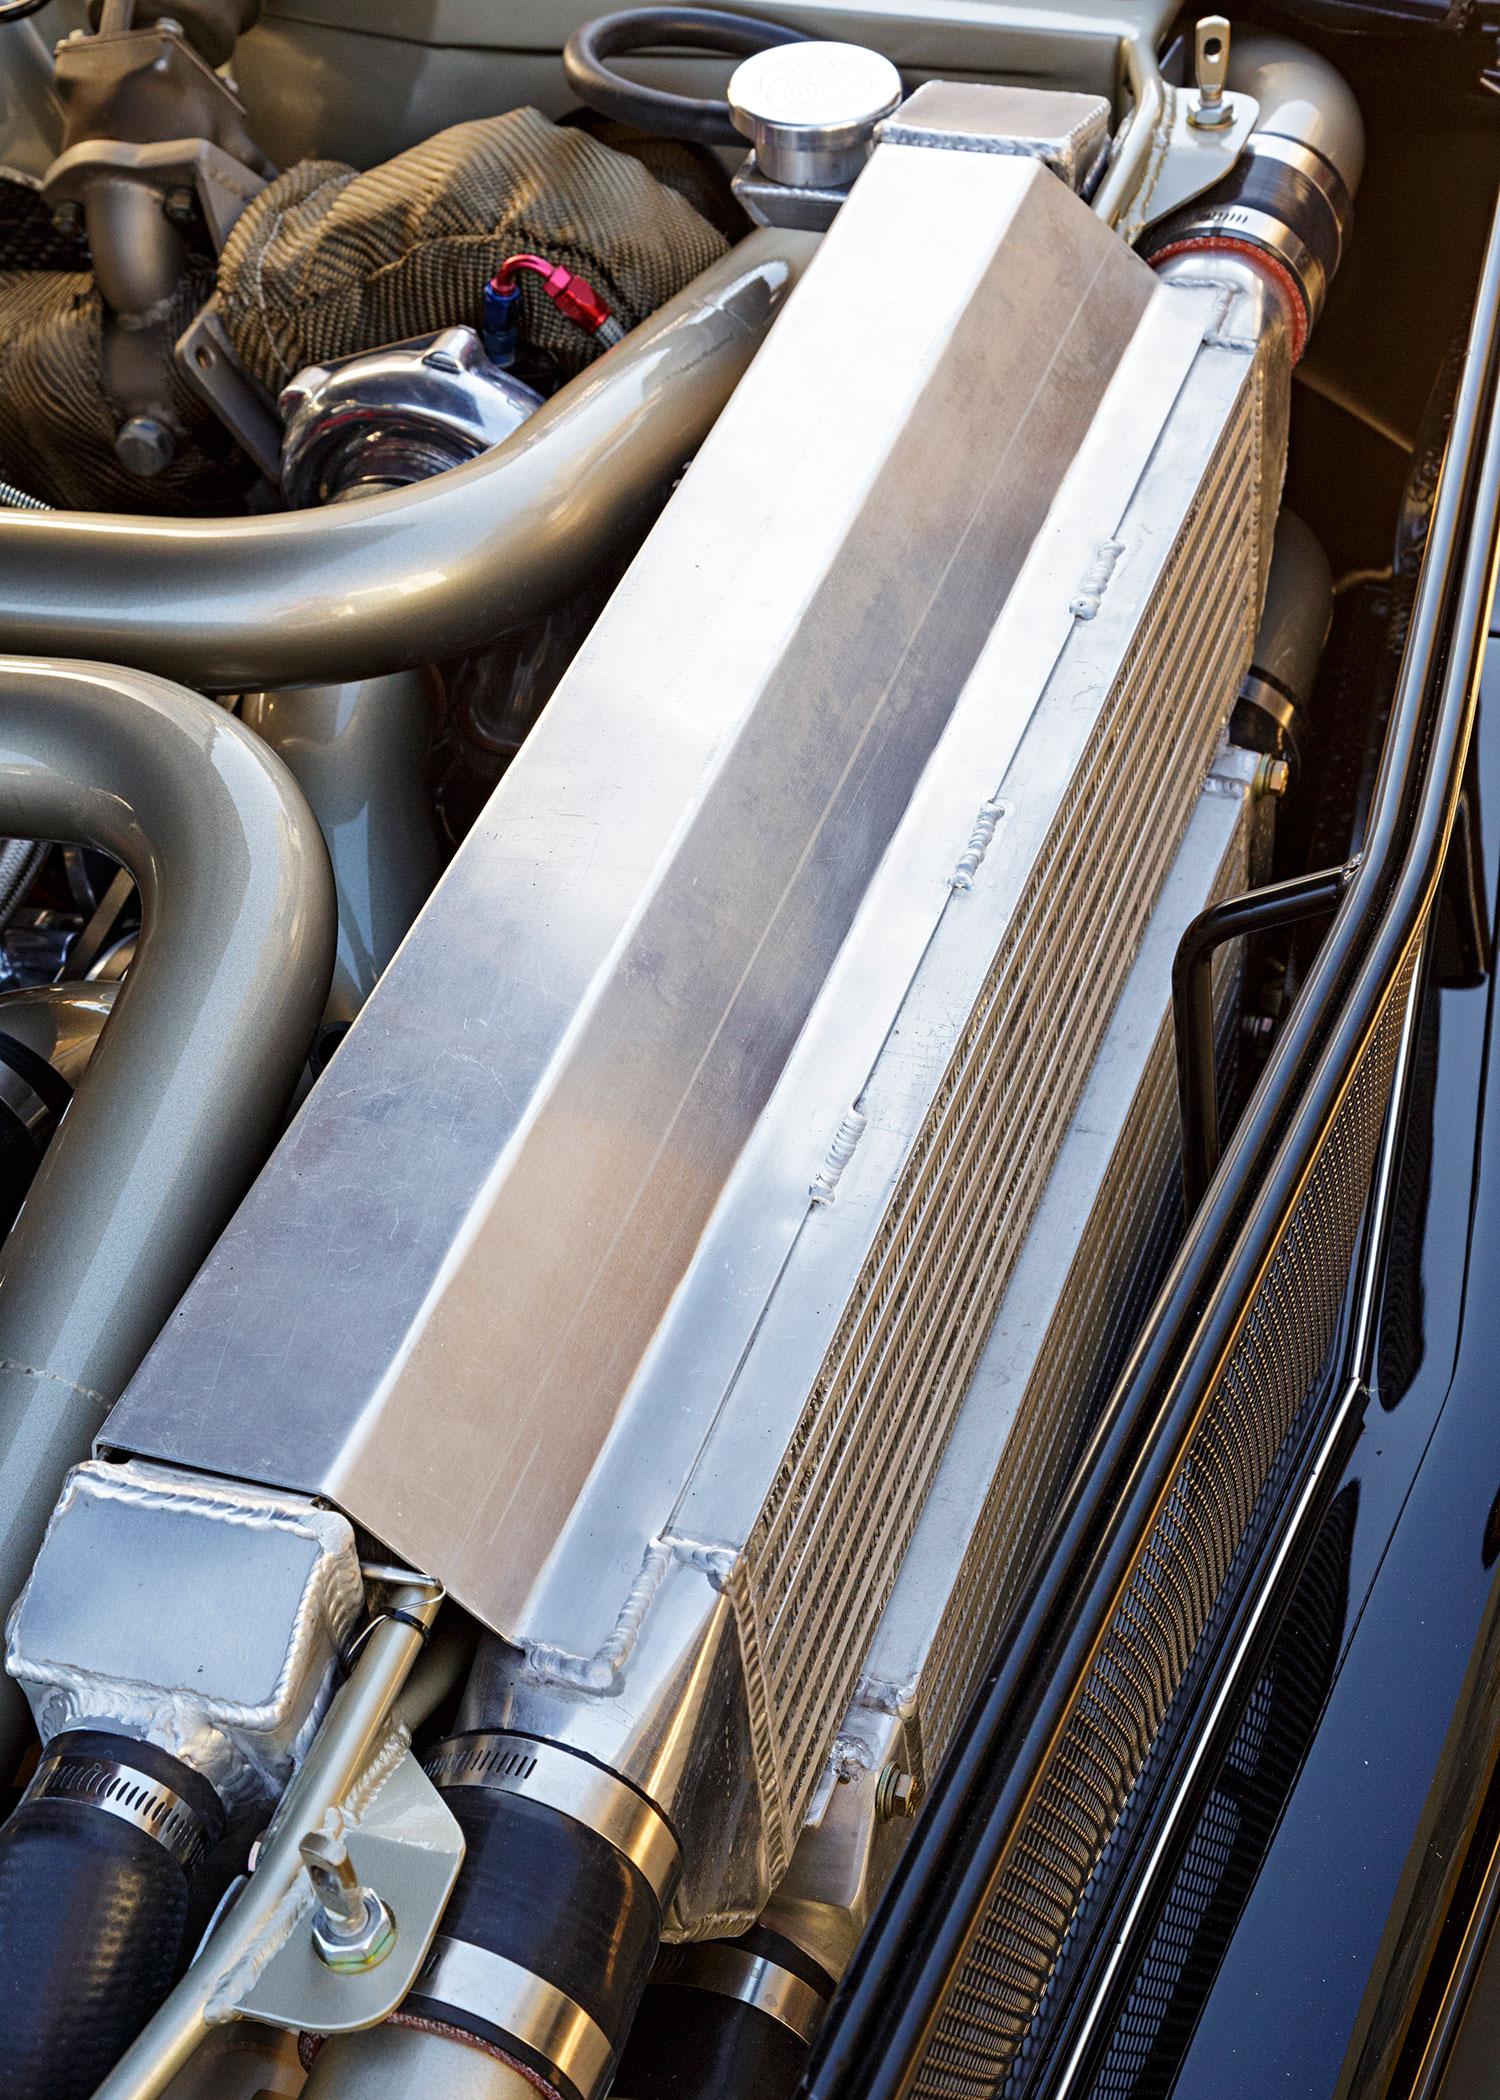 1968 Ford Mustang Radiator